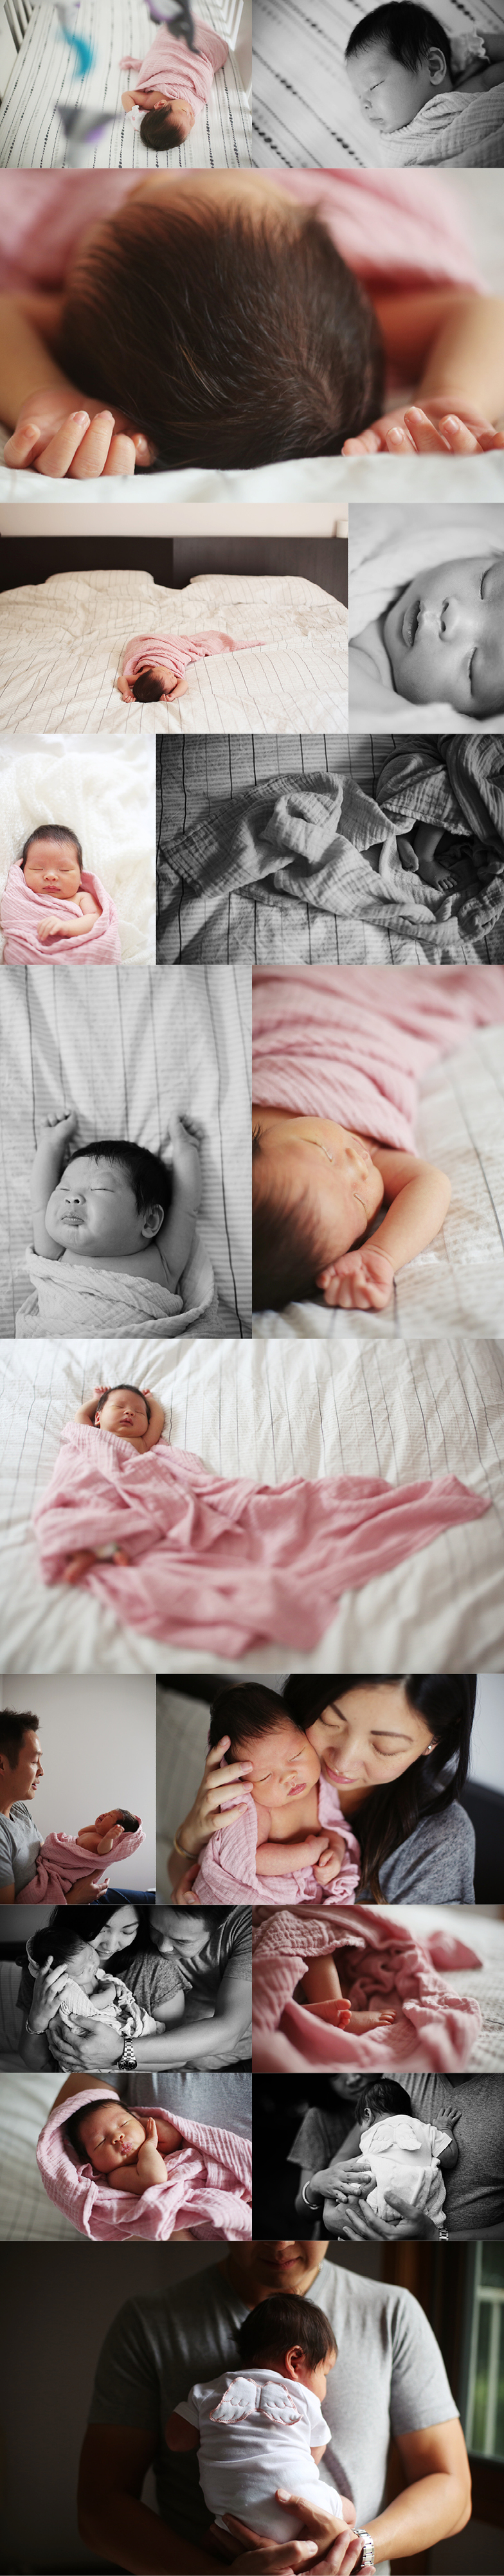 edmonton-lifestyle-newborn-photographer